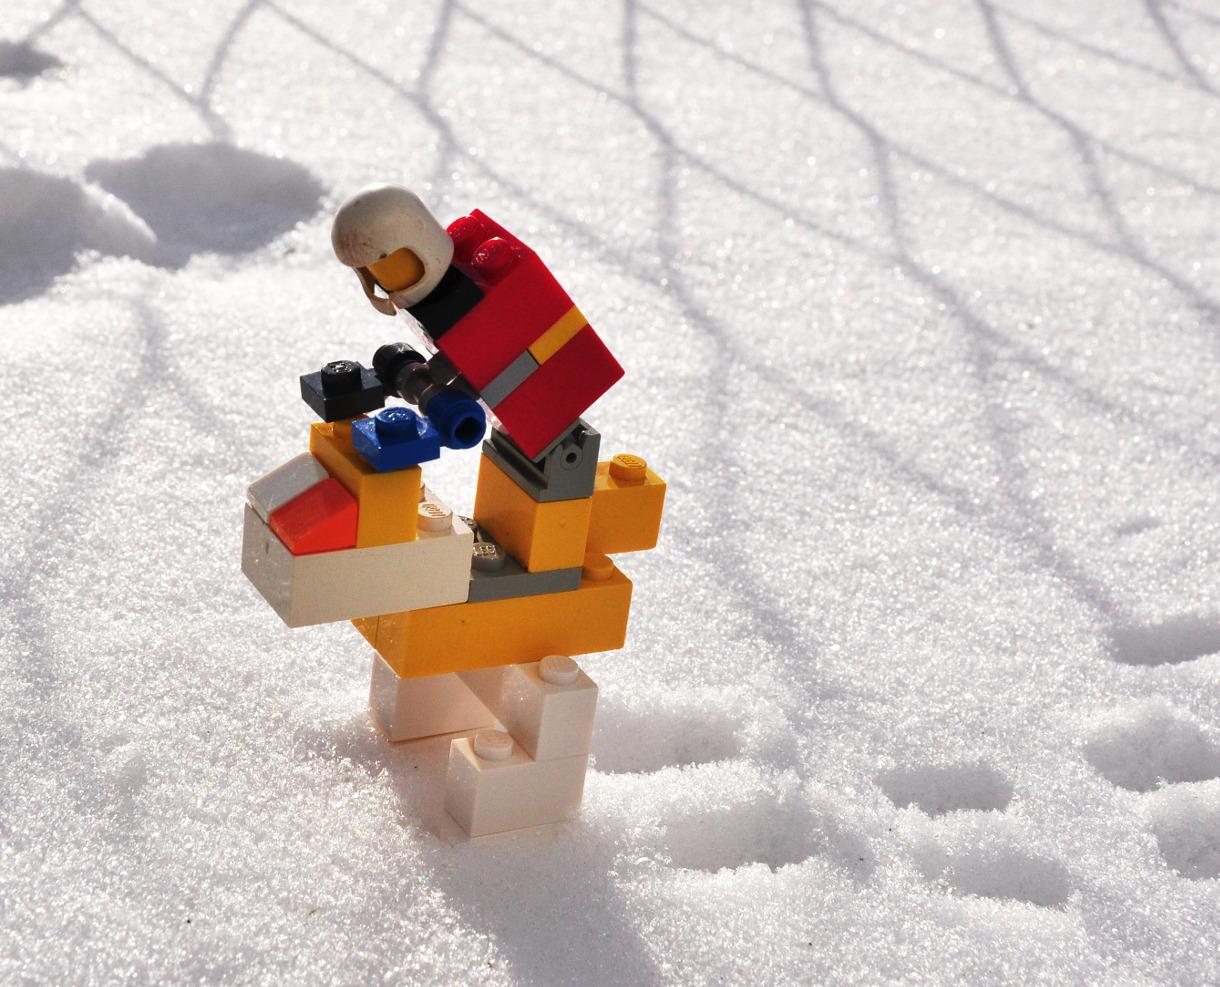 Lego biped rider